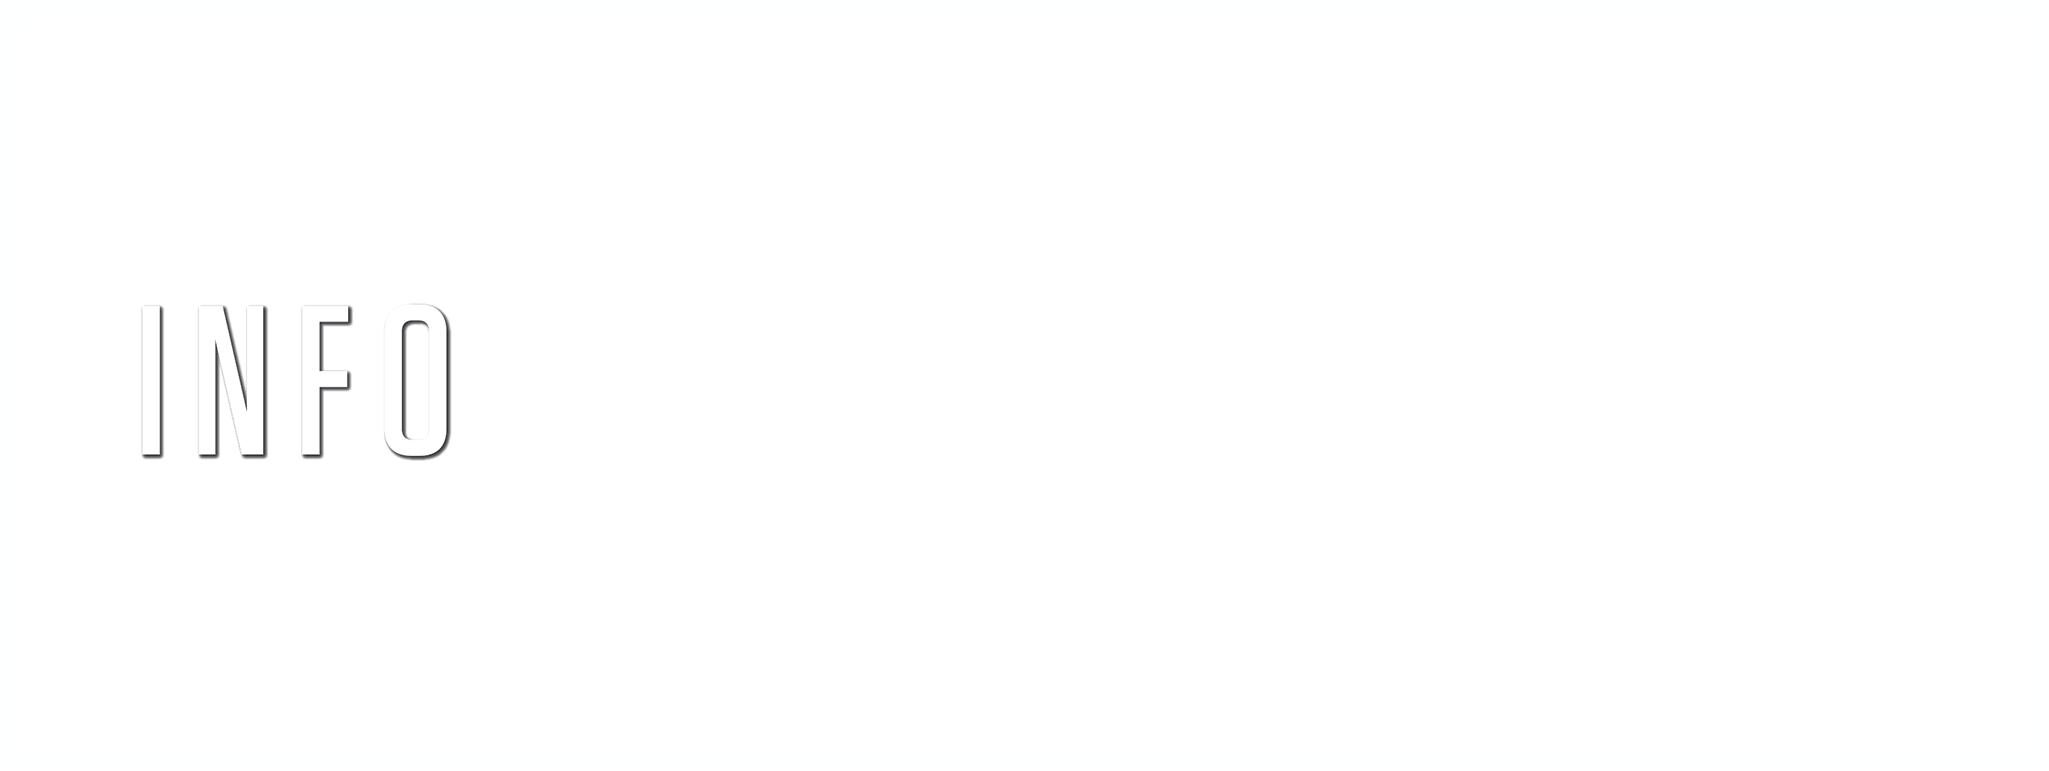 Line-up-transparent